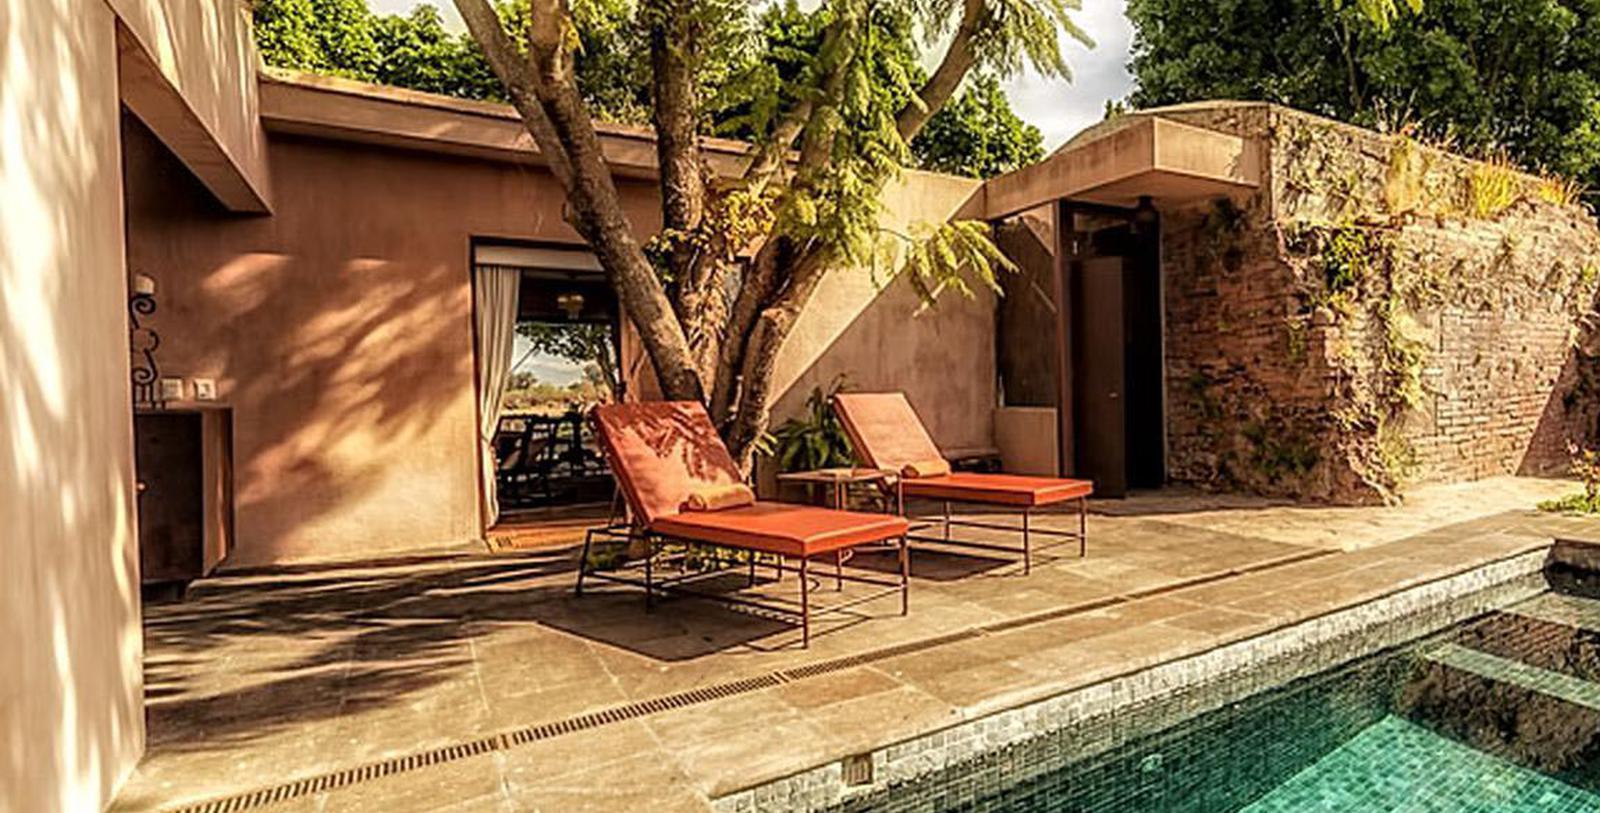 Image of Guestroom Exterior & Lounge Chairs by Pool, Hacienda el Carmen Hotel & Spa, Ahualulco de Mercado, 1722, Member of Historic Hotels Worldwide, Hot Deals